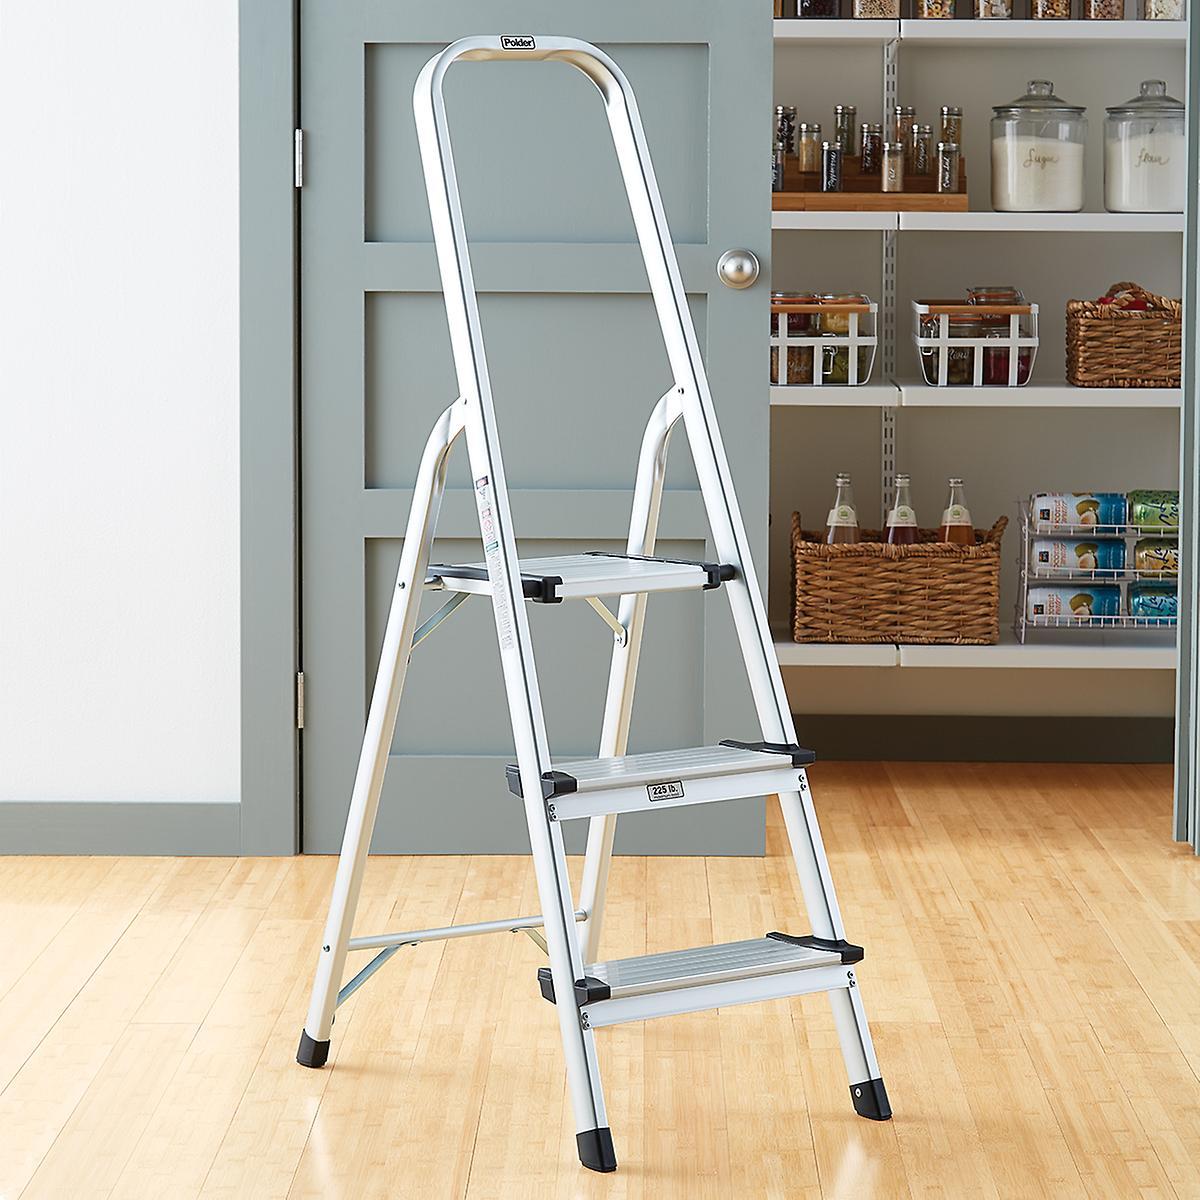 Super Polder 3 5 Step Aluminum Folding Ladders Machost Co Dining Chair Design Ideas Machostcouk